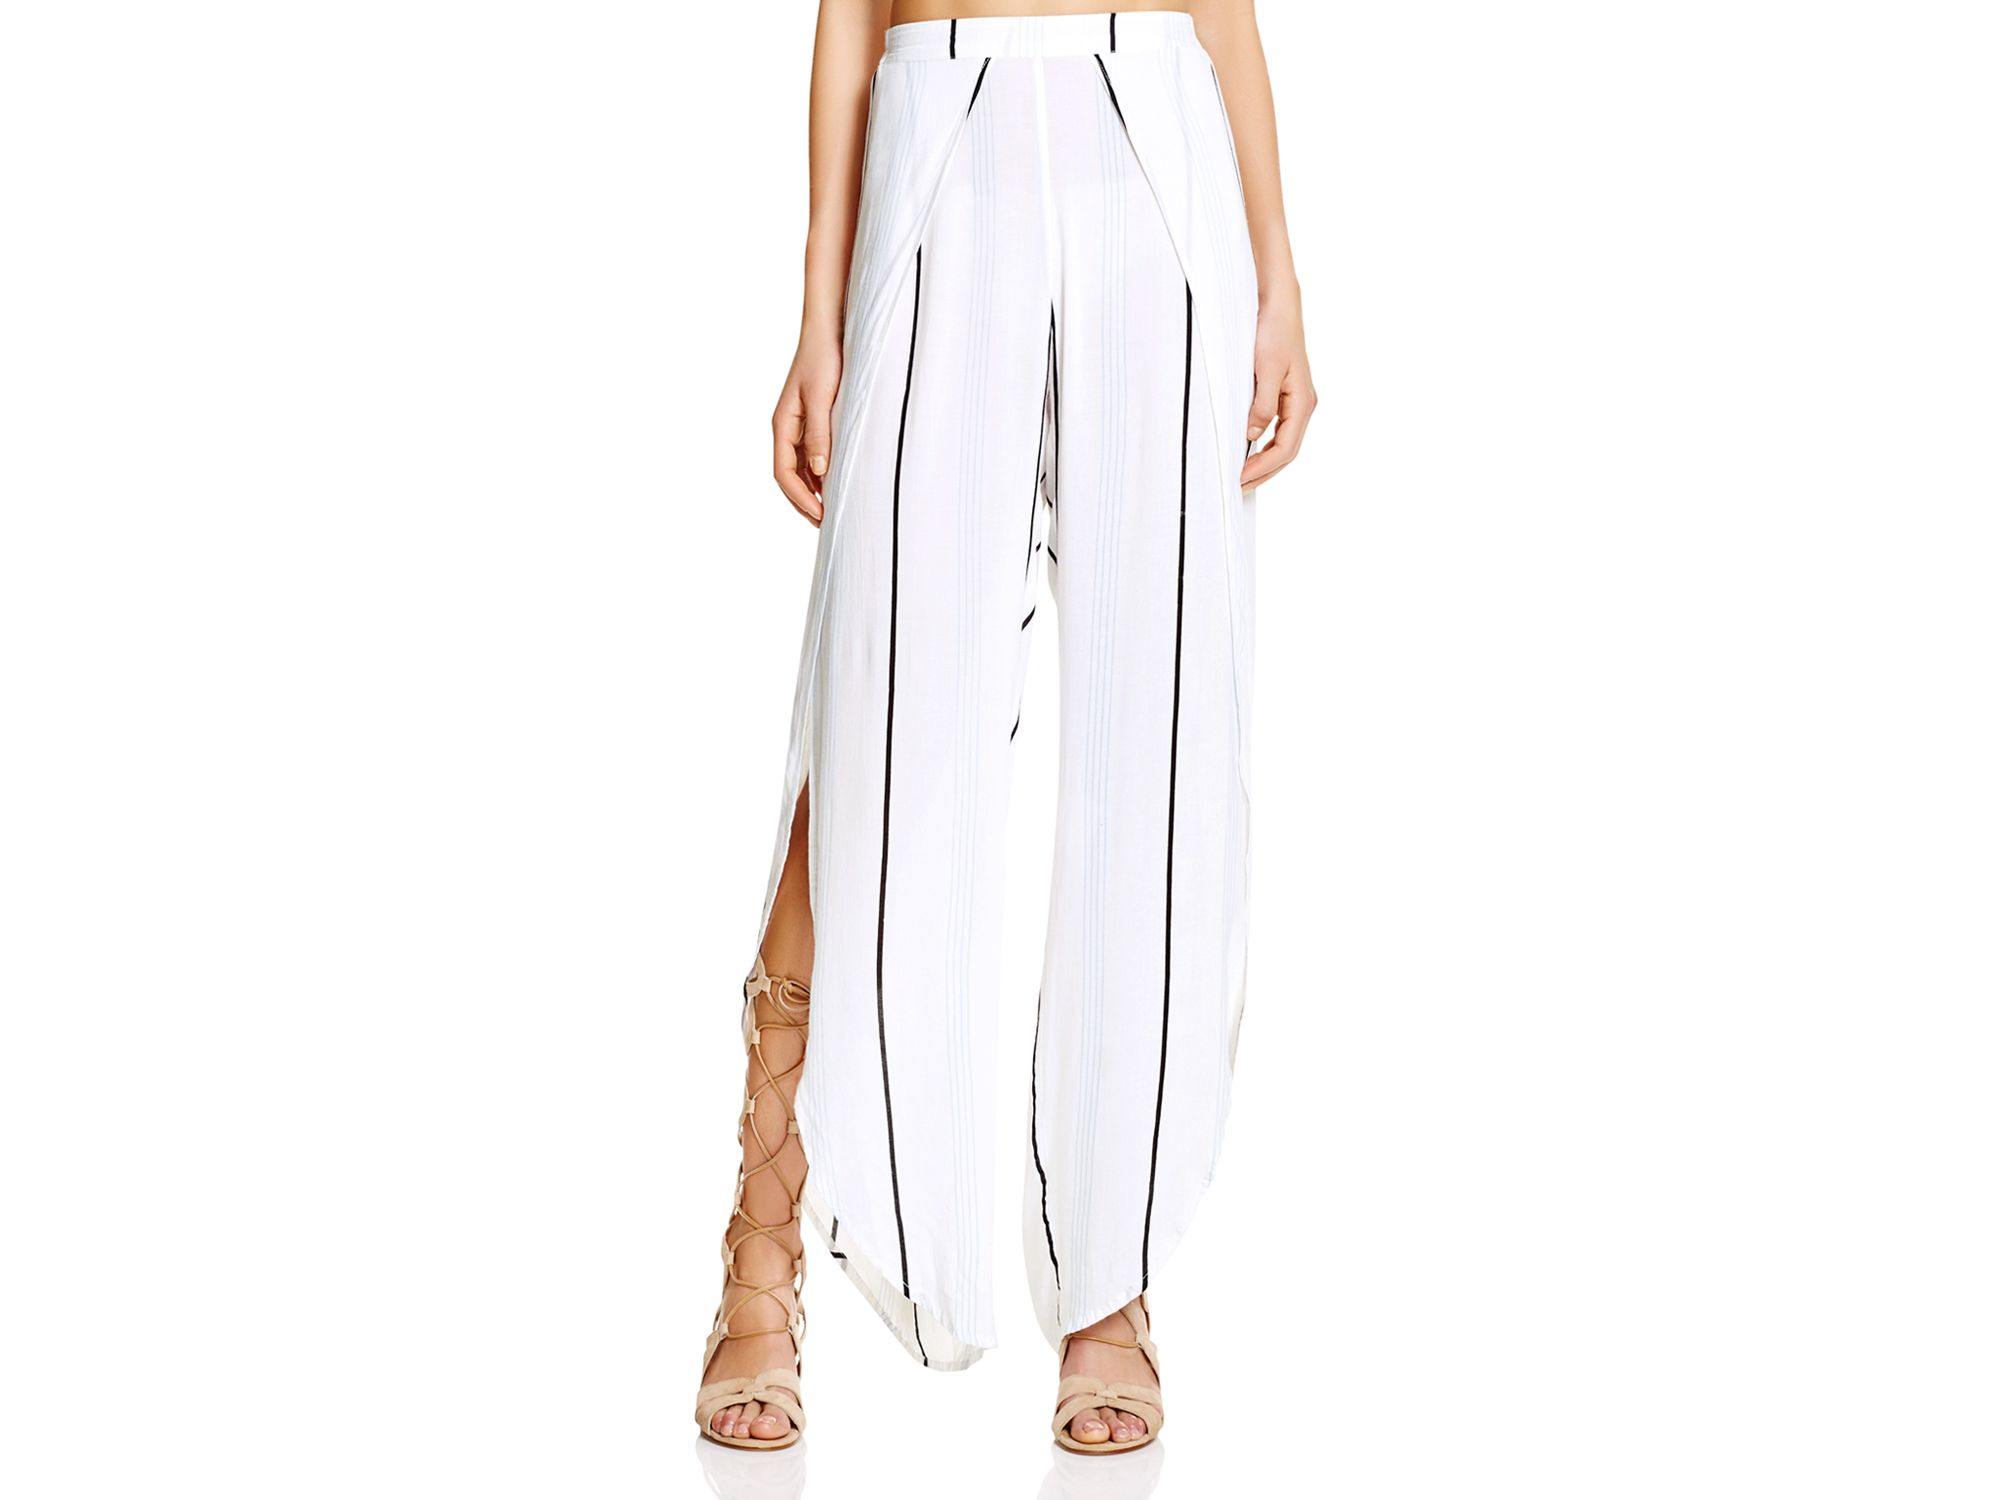 wide leg pants with slits - Pi Pants